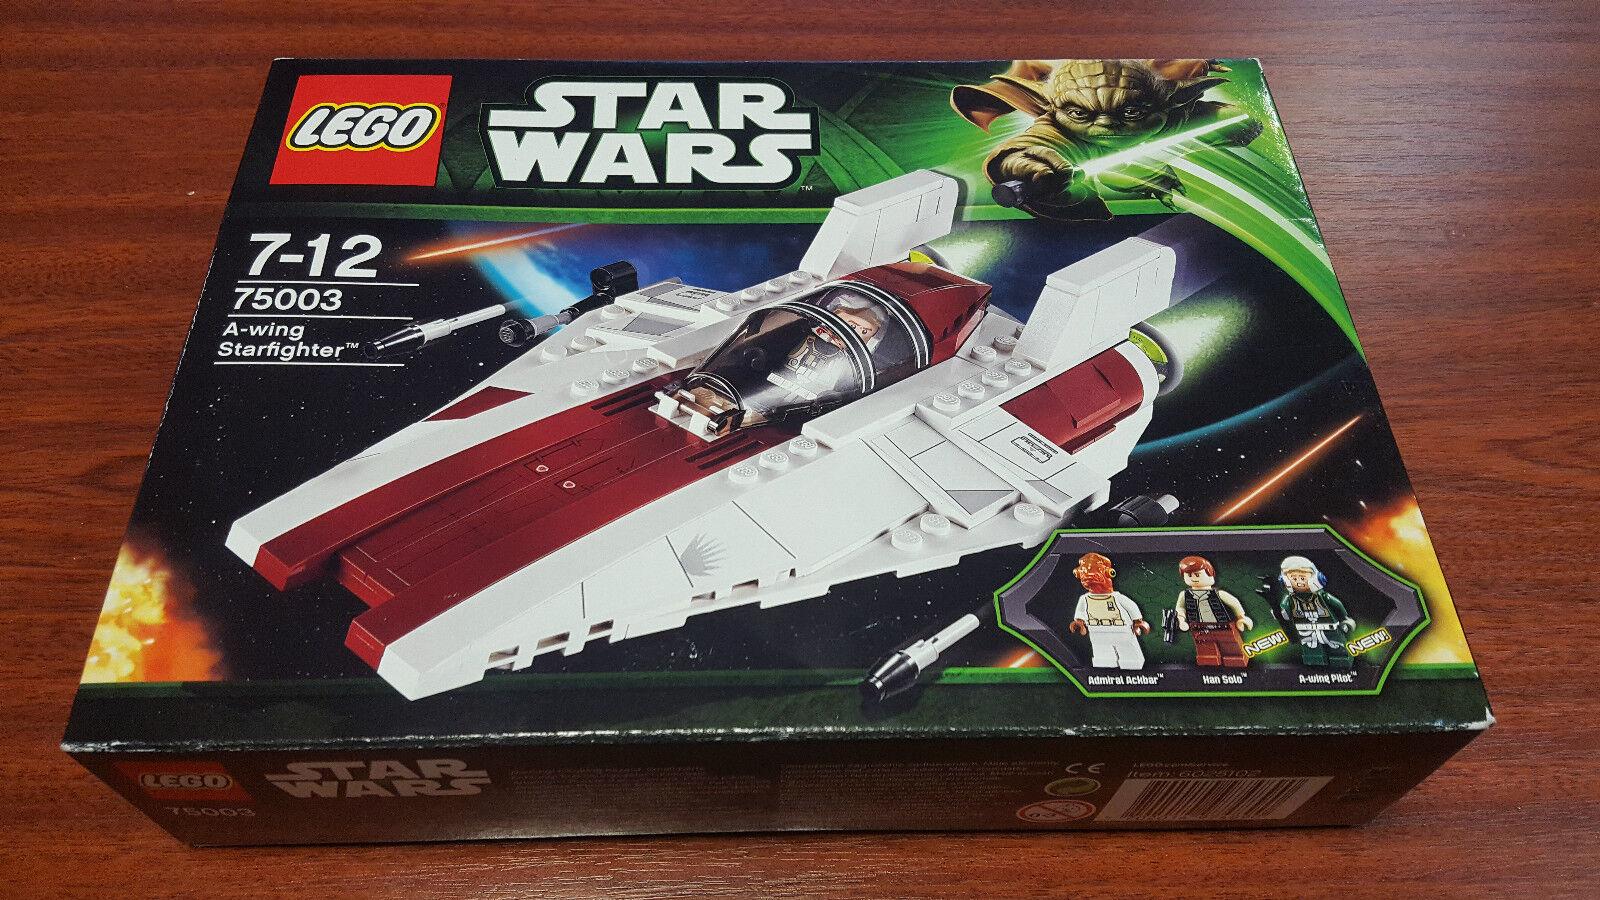 LEGO STAR WARS 75003  A-WING Starfighter   - nouveau - NEUF - SUPERBE - RARE  votre satisfaction est notre cible